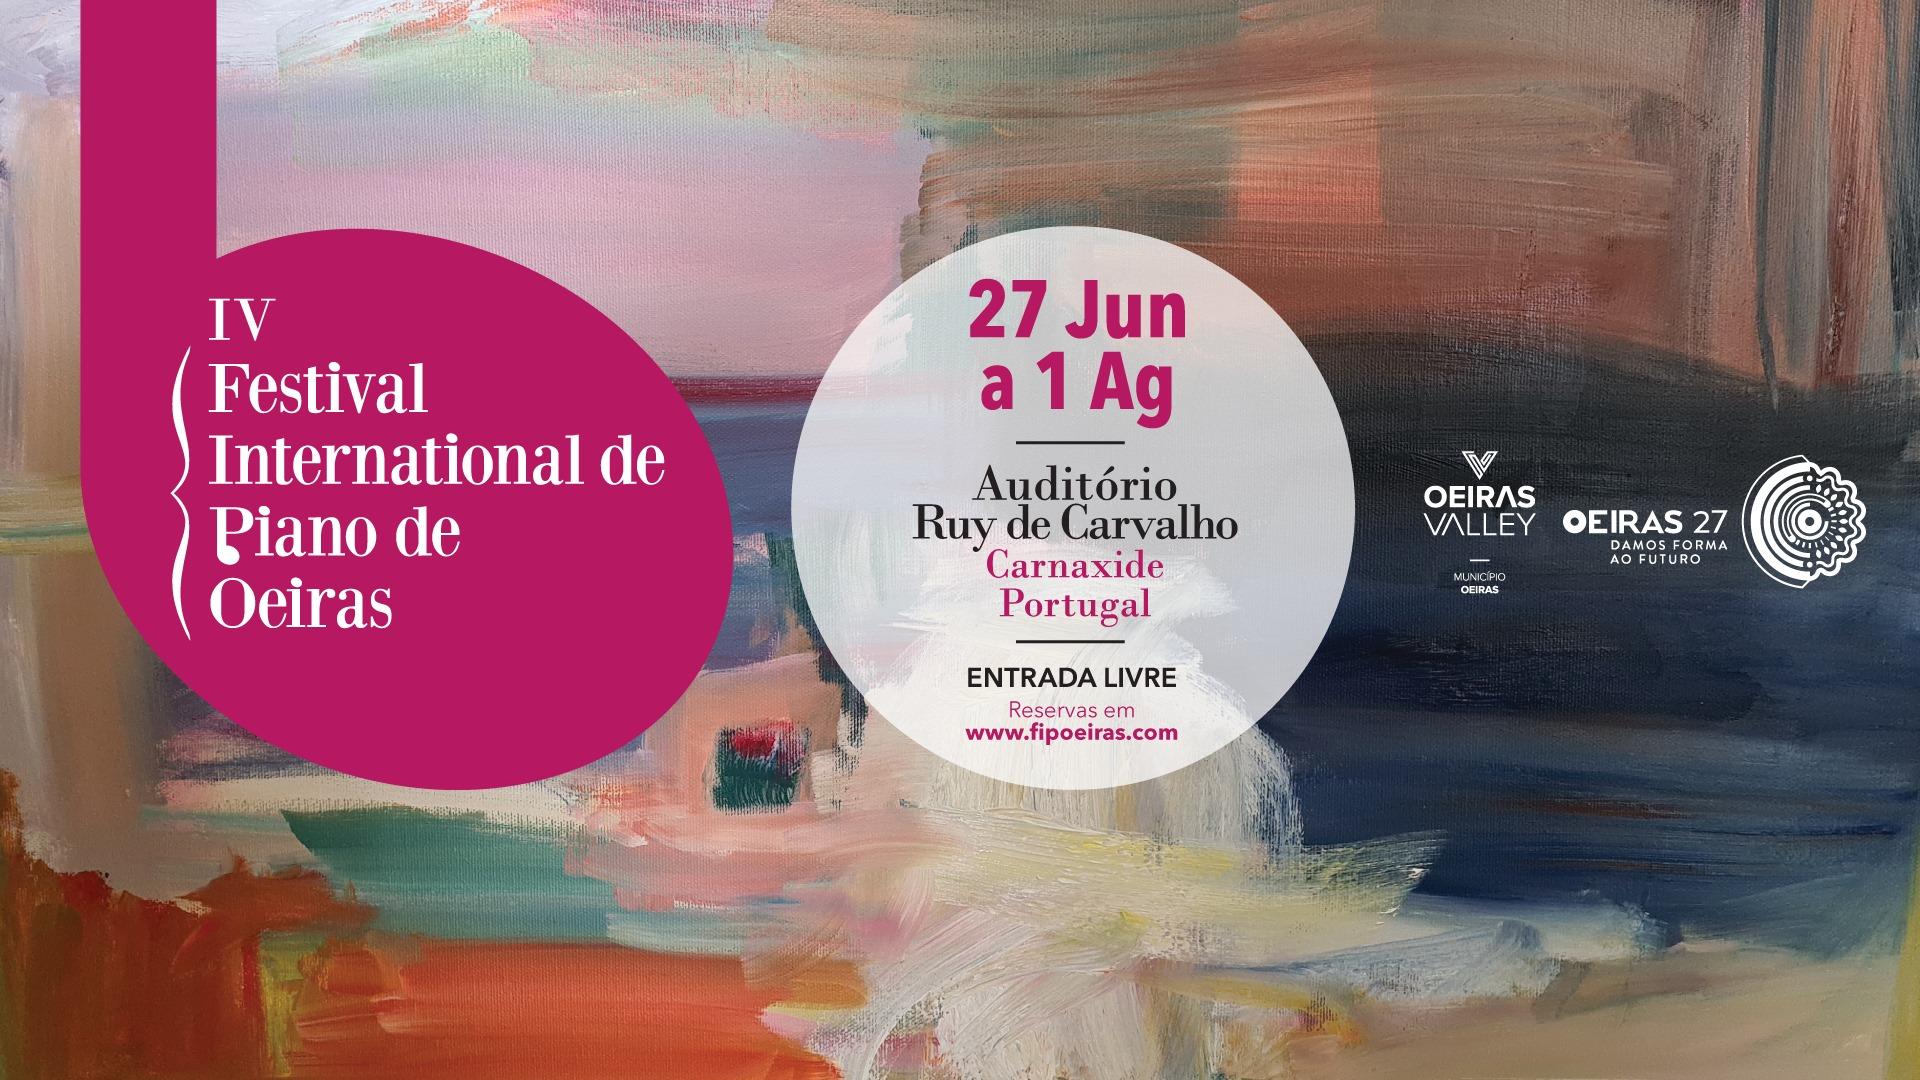 IV Festival Internacional de Piano de Oeiras